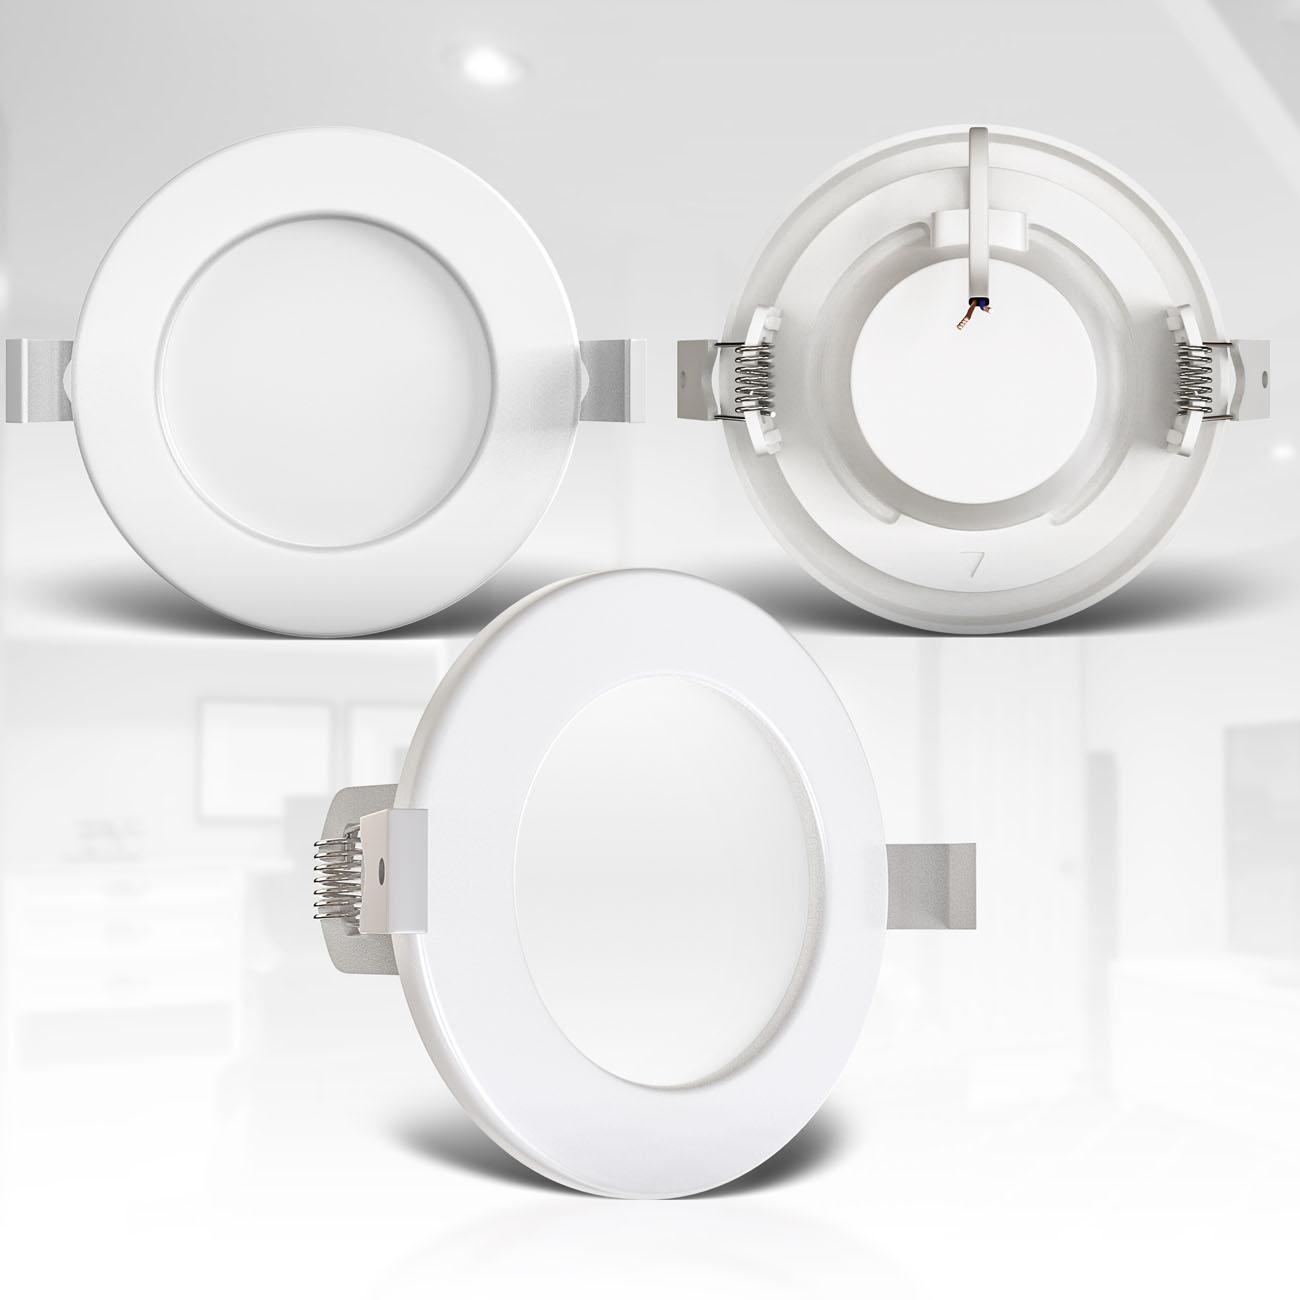 LED Einbaustrahler | Bad Einbauleuchte 6er SET | ultra flach 6W IP44 dimmbar - 6